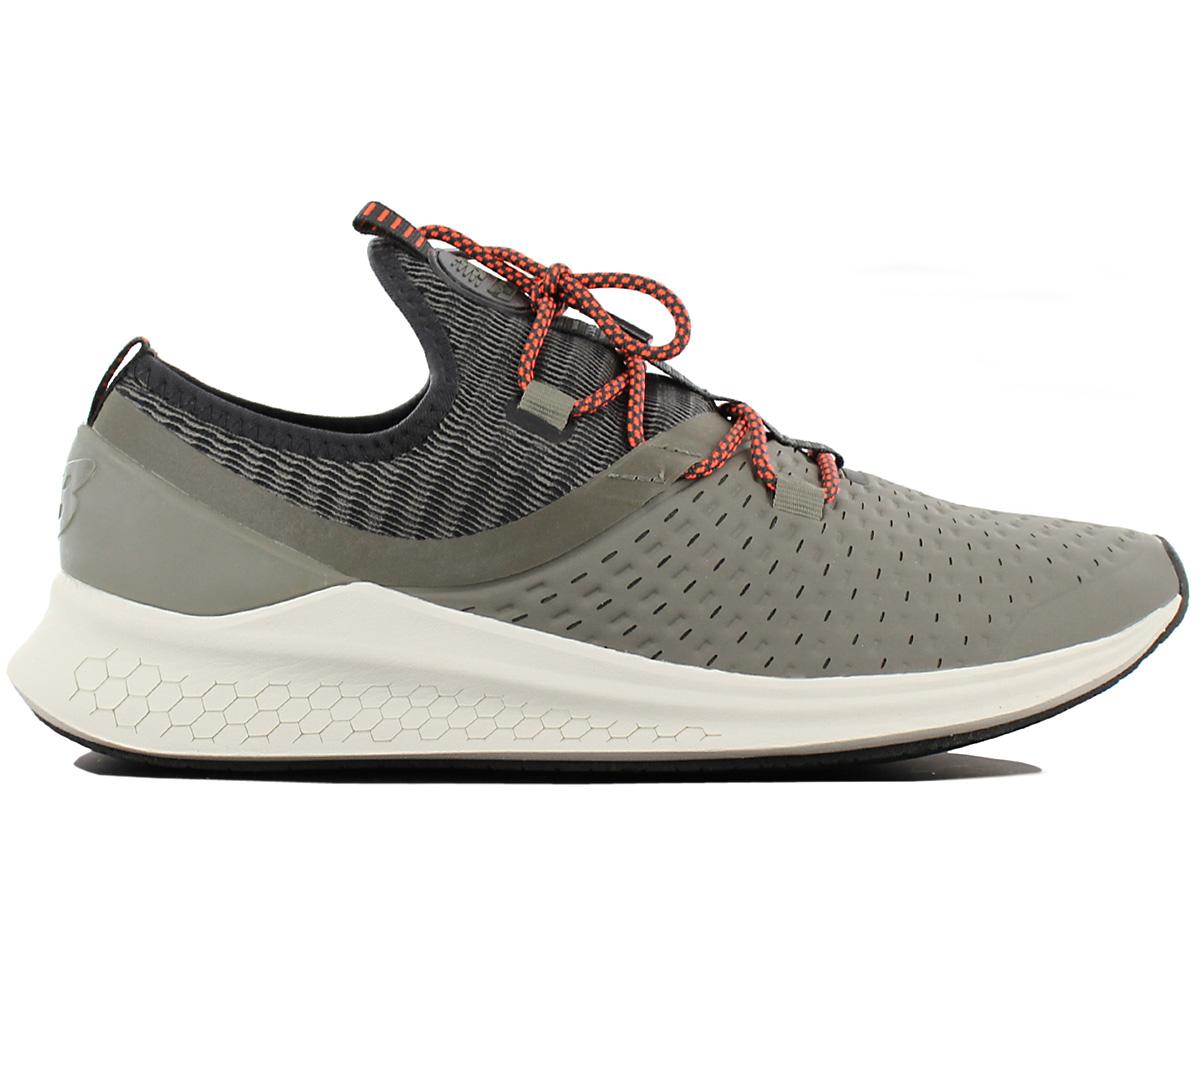 e63069dea3687 New Balance Fresh Foam Lazr Hyposkin Men's Shoes Mlazrhm New | eBay